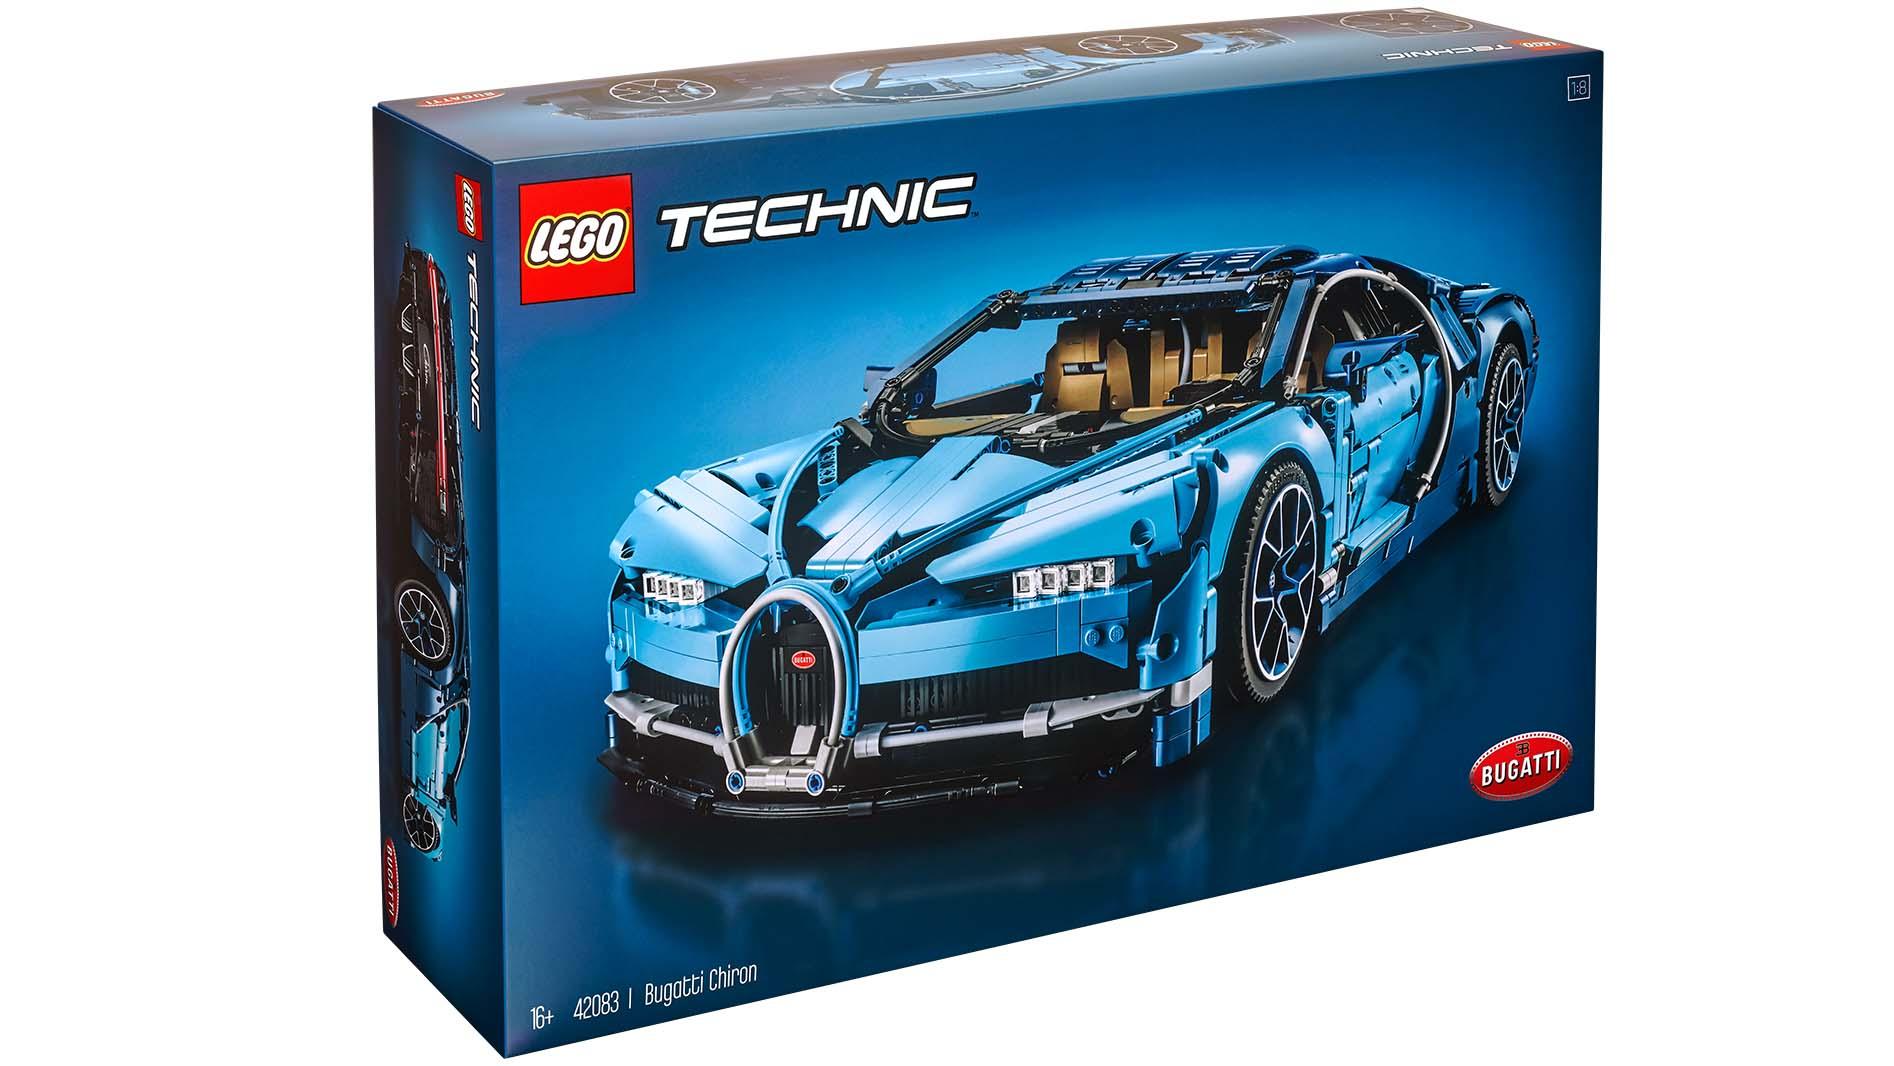 The New Lego Technic Bugatti Chiron Has 3 599 Pieces Top